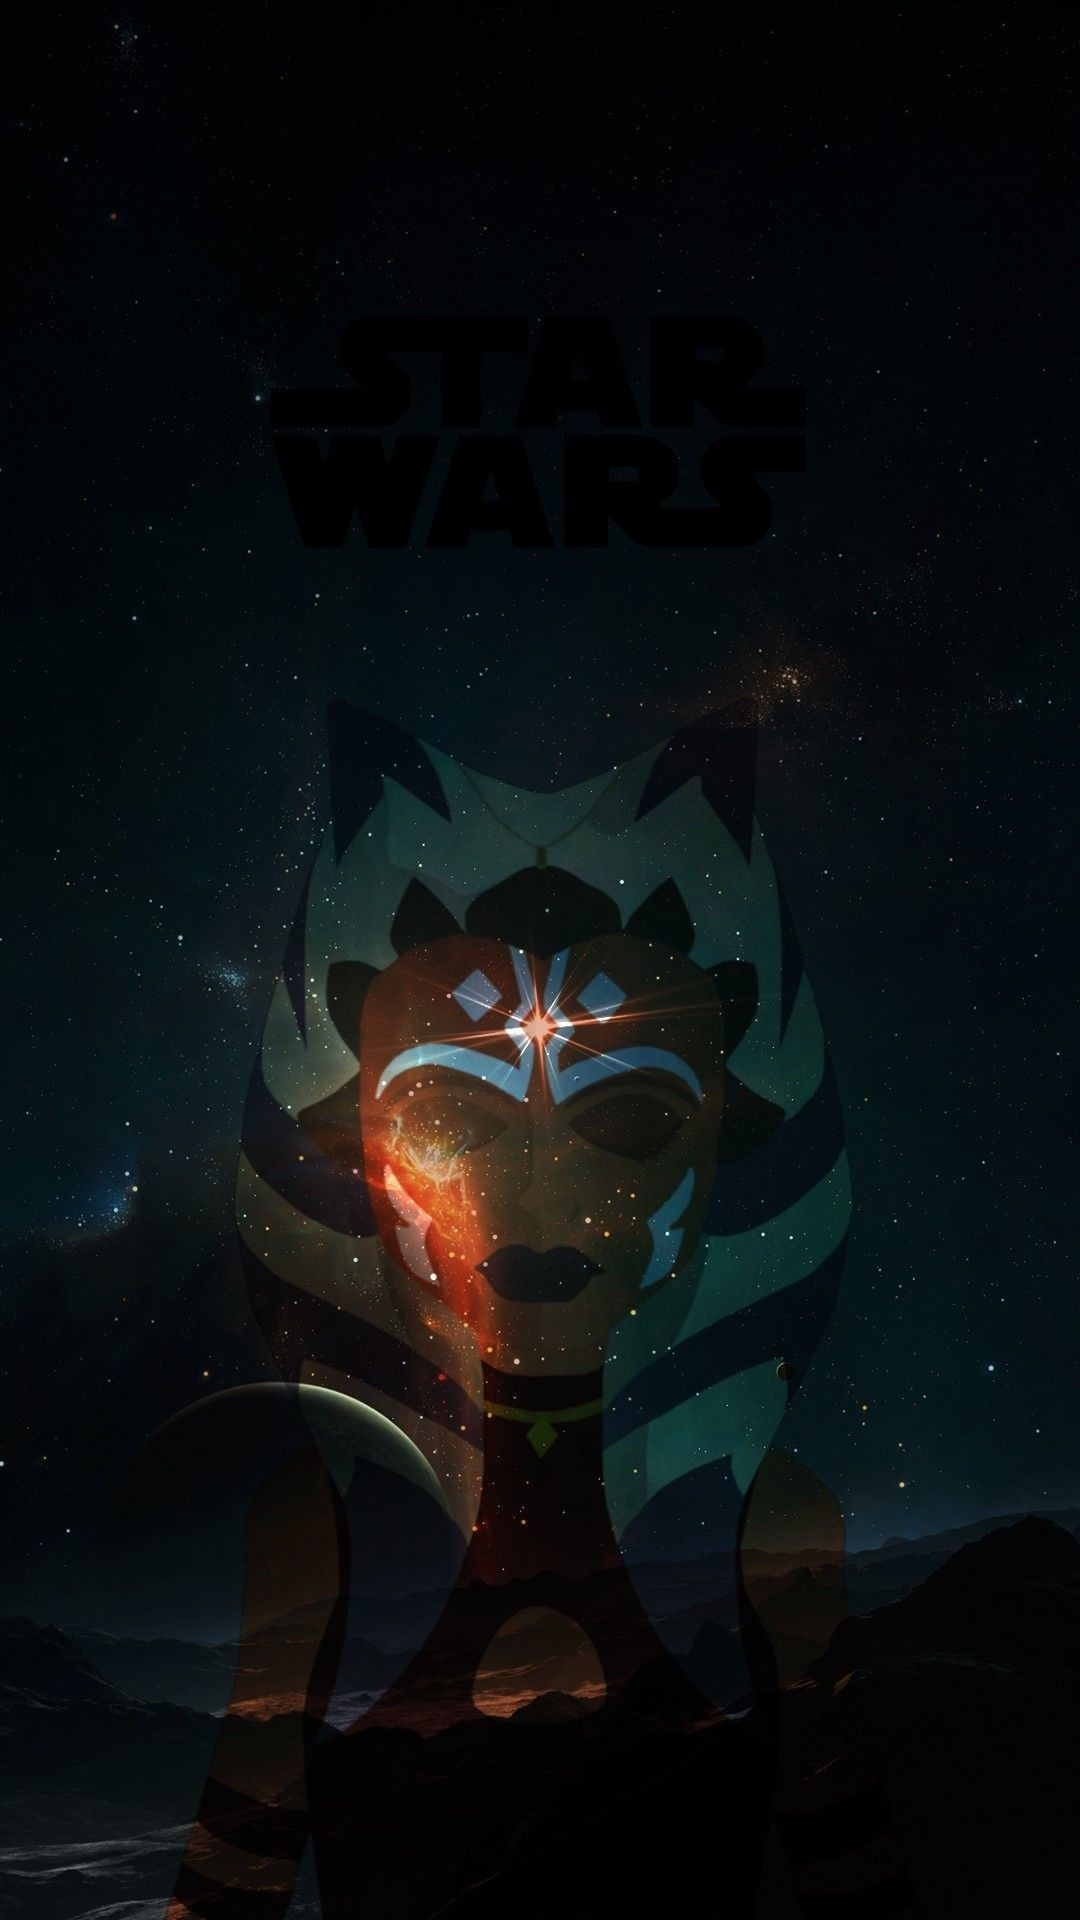 Ahsoka Wallpaper Zeichnen Geschichte Star Wars Symbole 1080x1920 Download Hd Wallpaper Wallpapertip